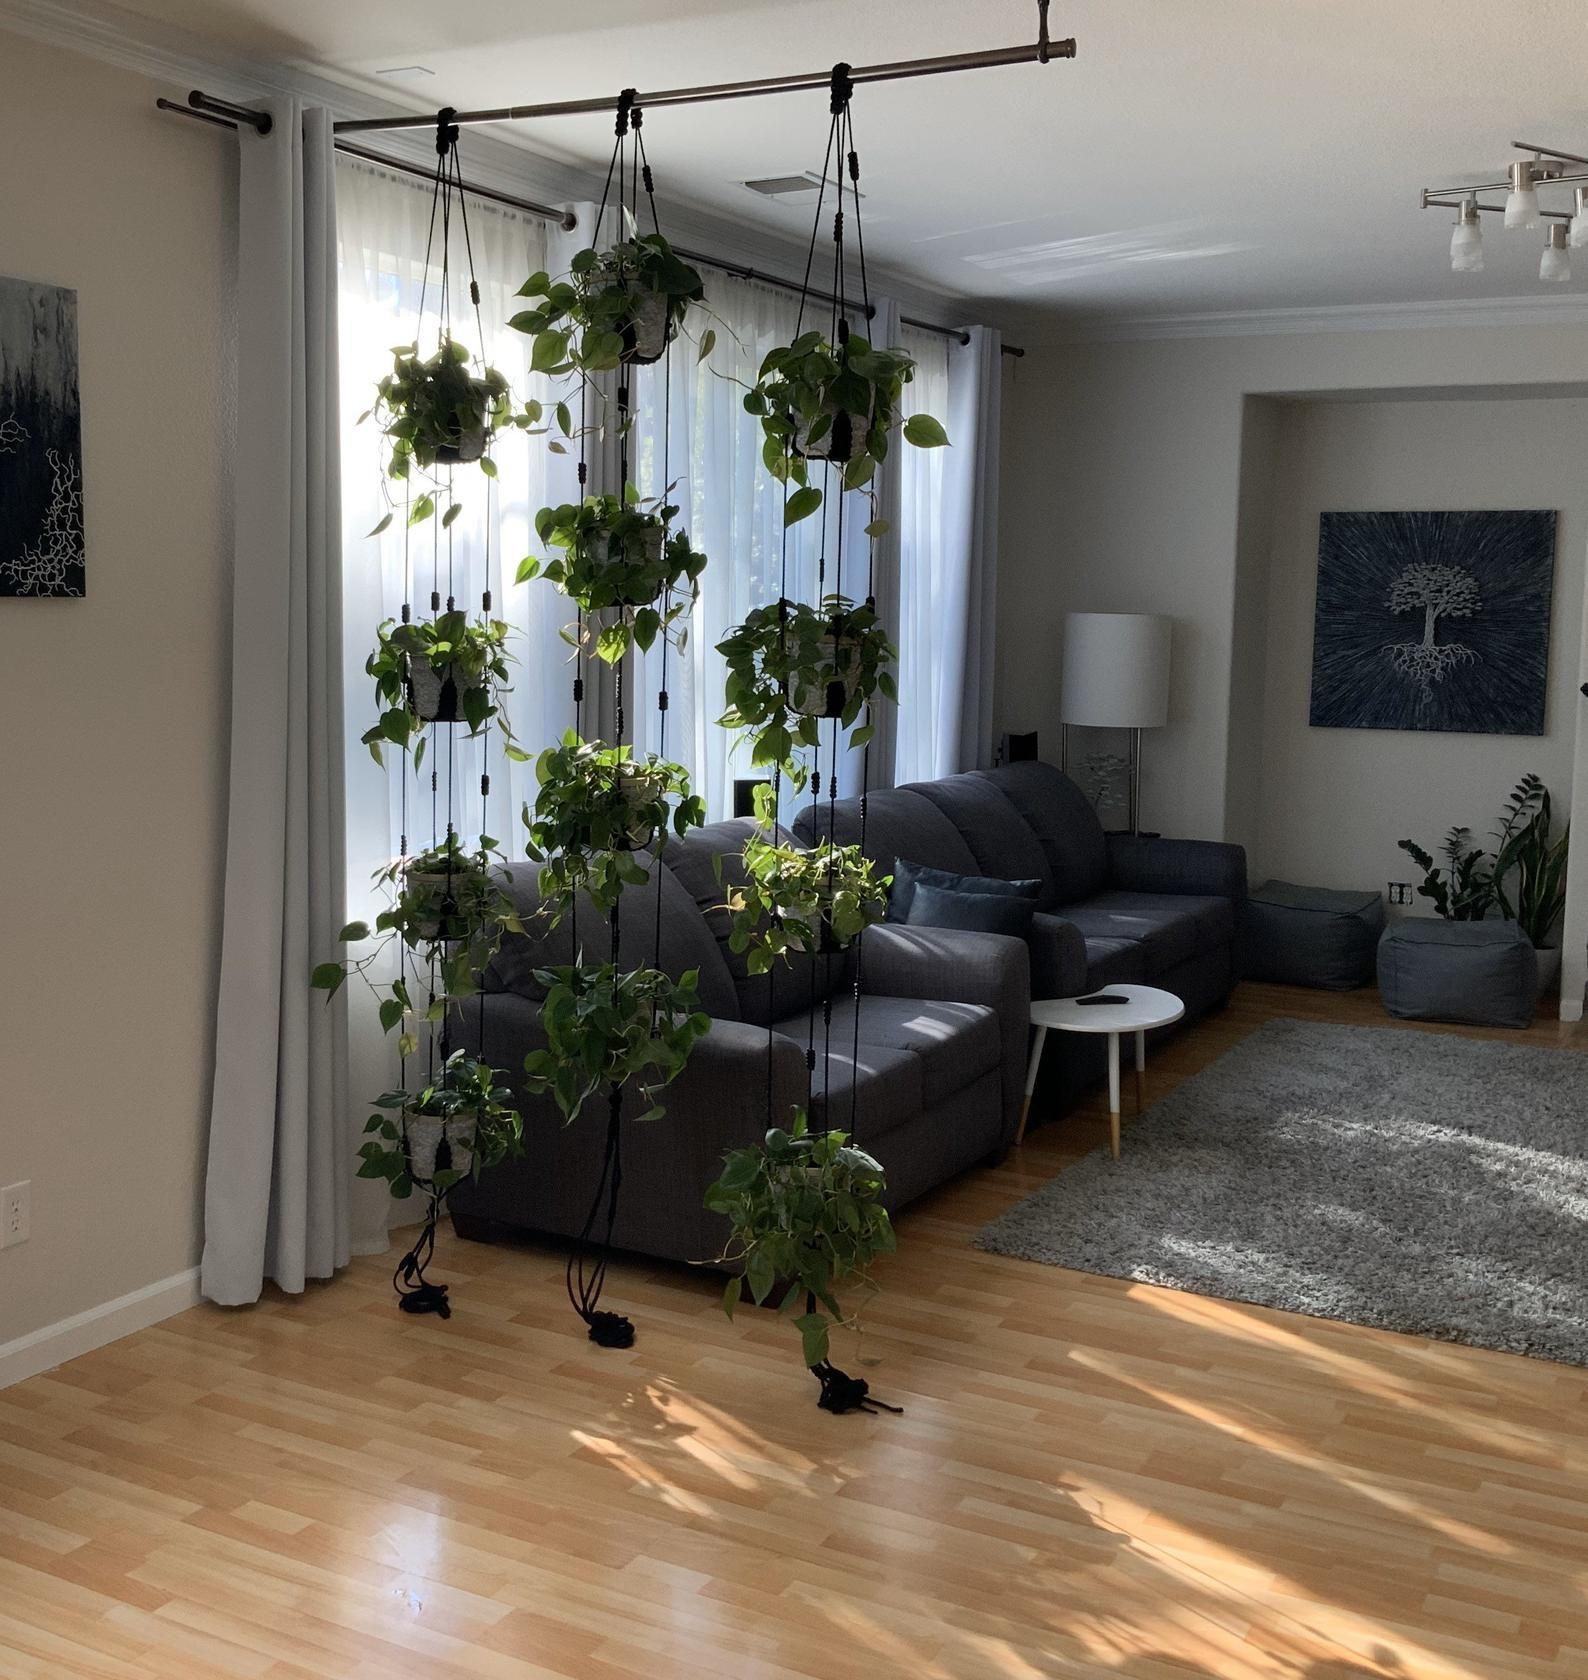 Adjustable plant hanging, multiple plants, room divider, hanging shelves, wall planter, macrame, space saving planter, mother's day gift.